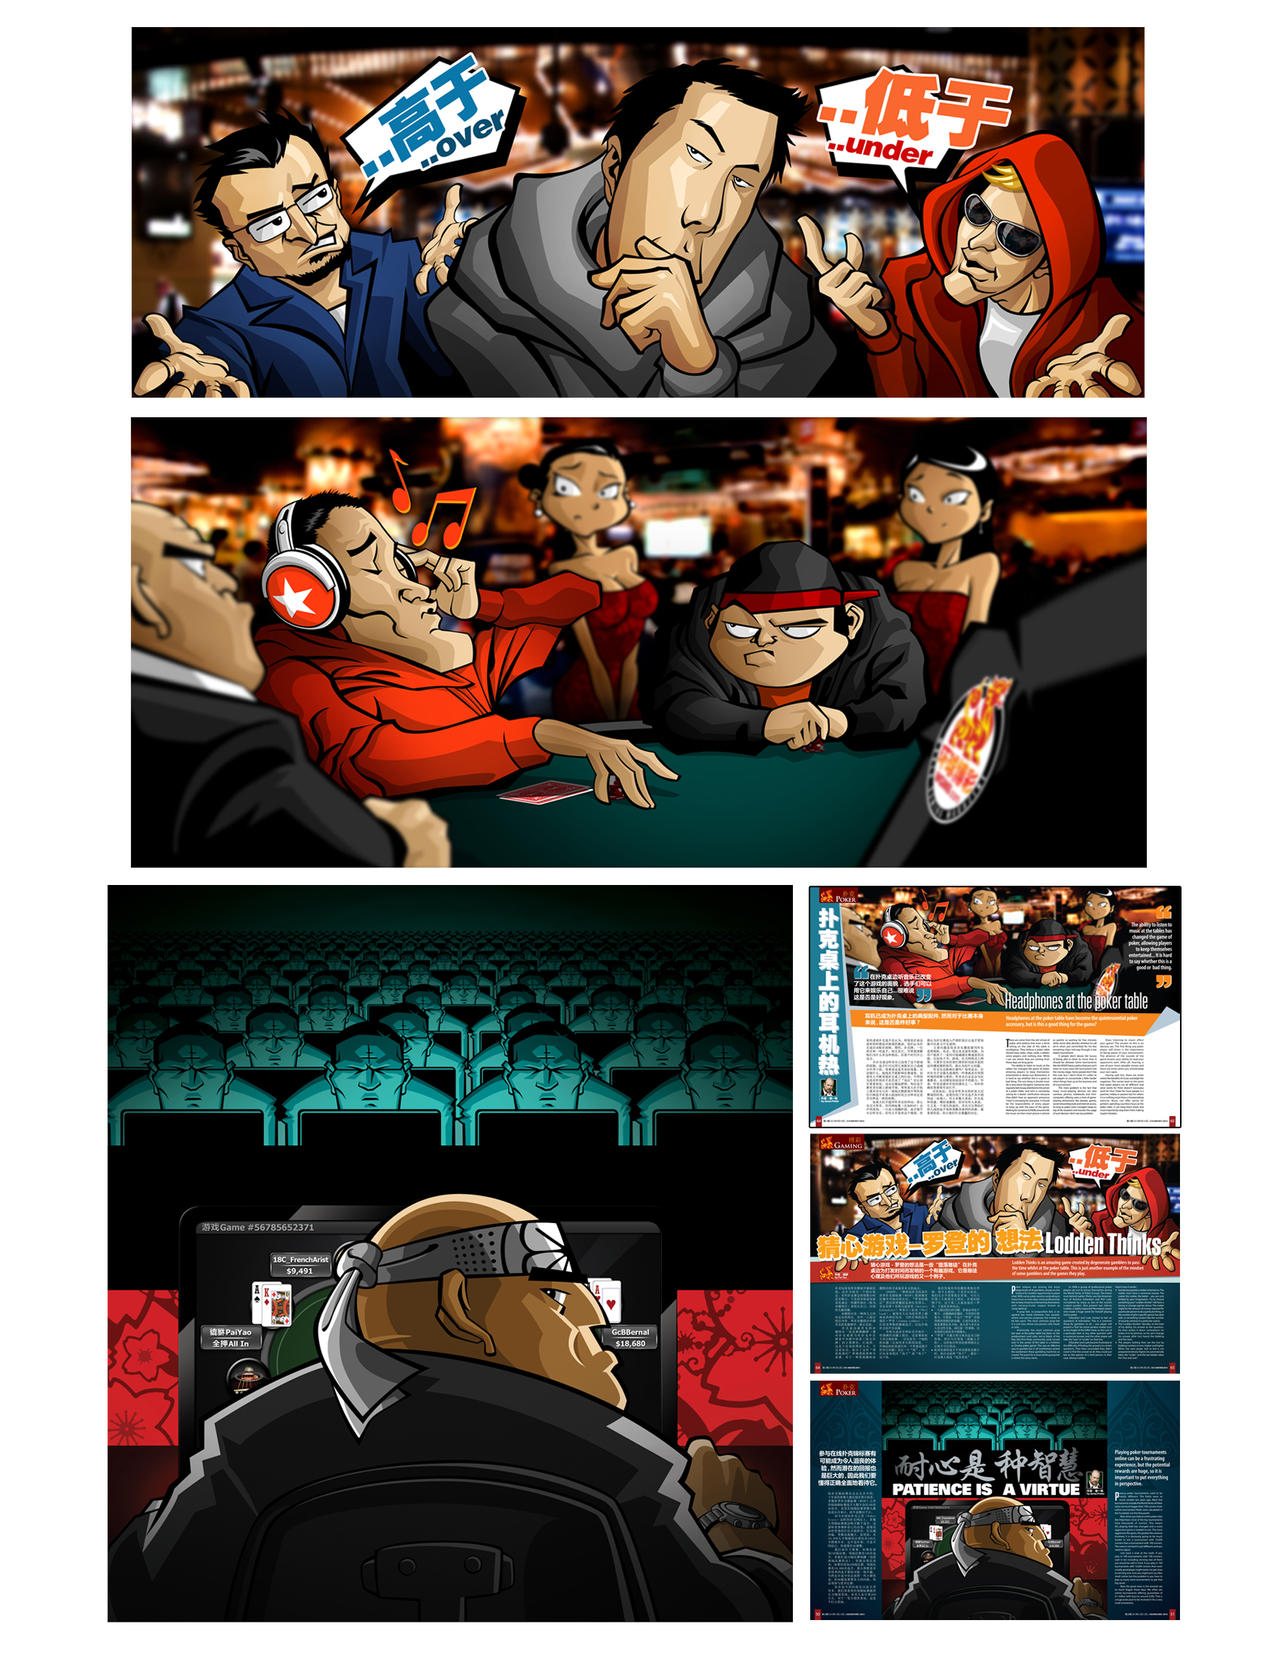 WG Illustrations by mrrogers4566